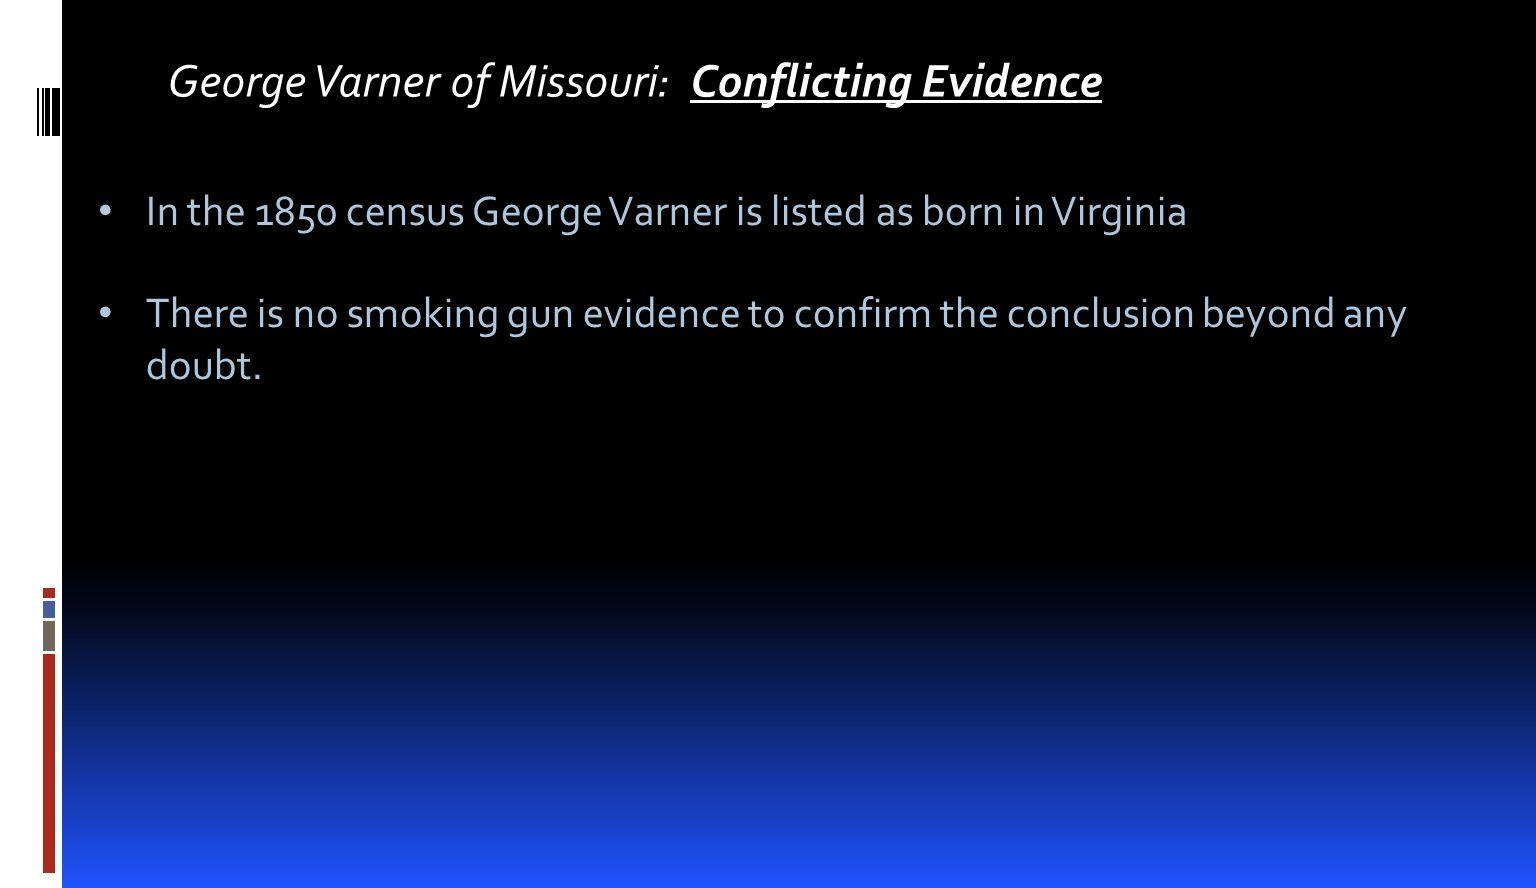 George Varner of Missouri: Conflicting Evidence